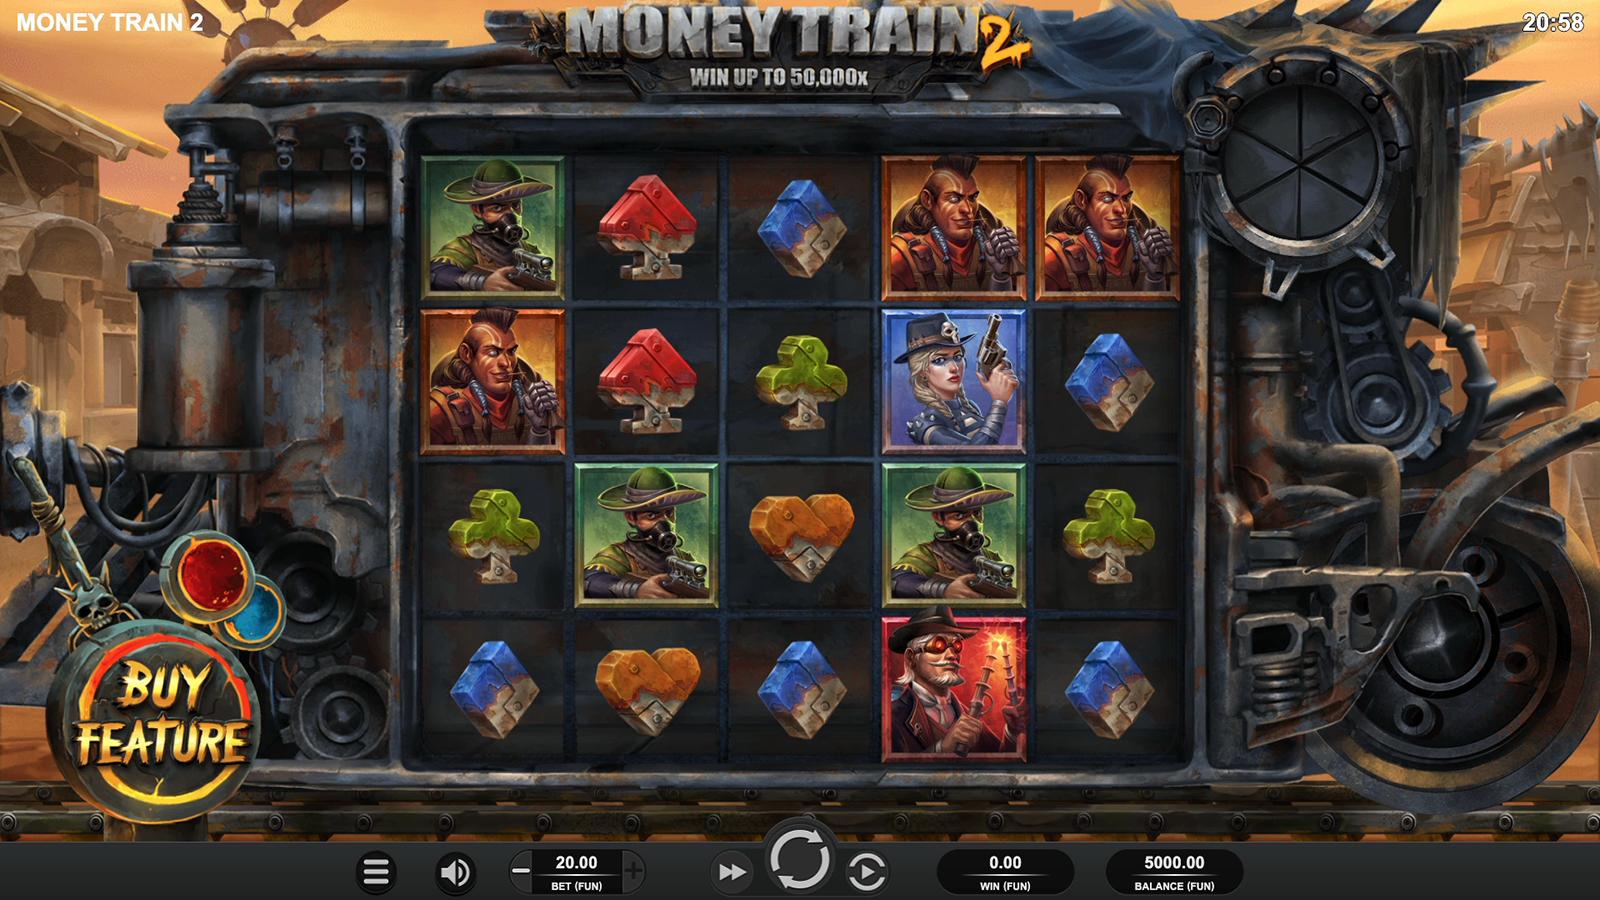 Money Train 2 Screenshot